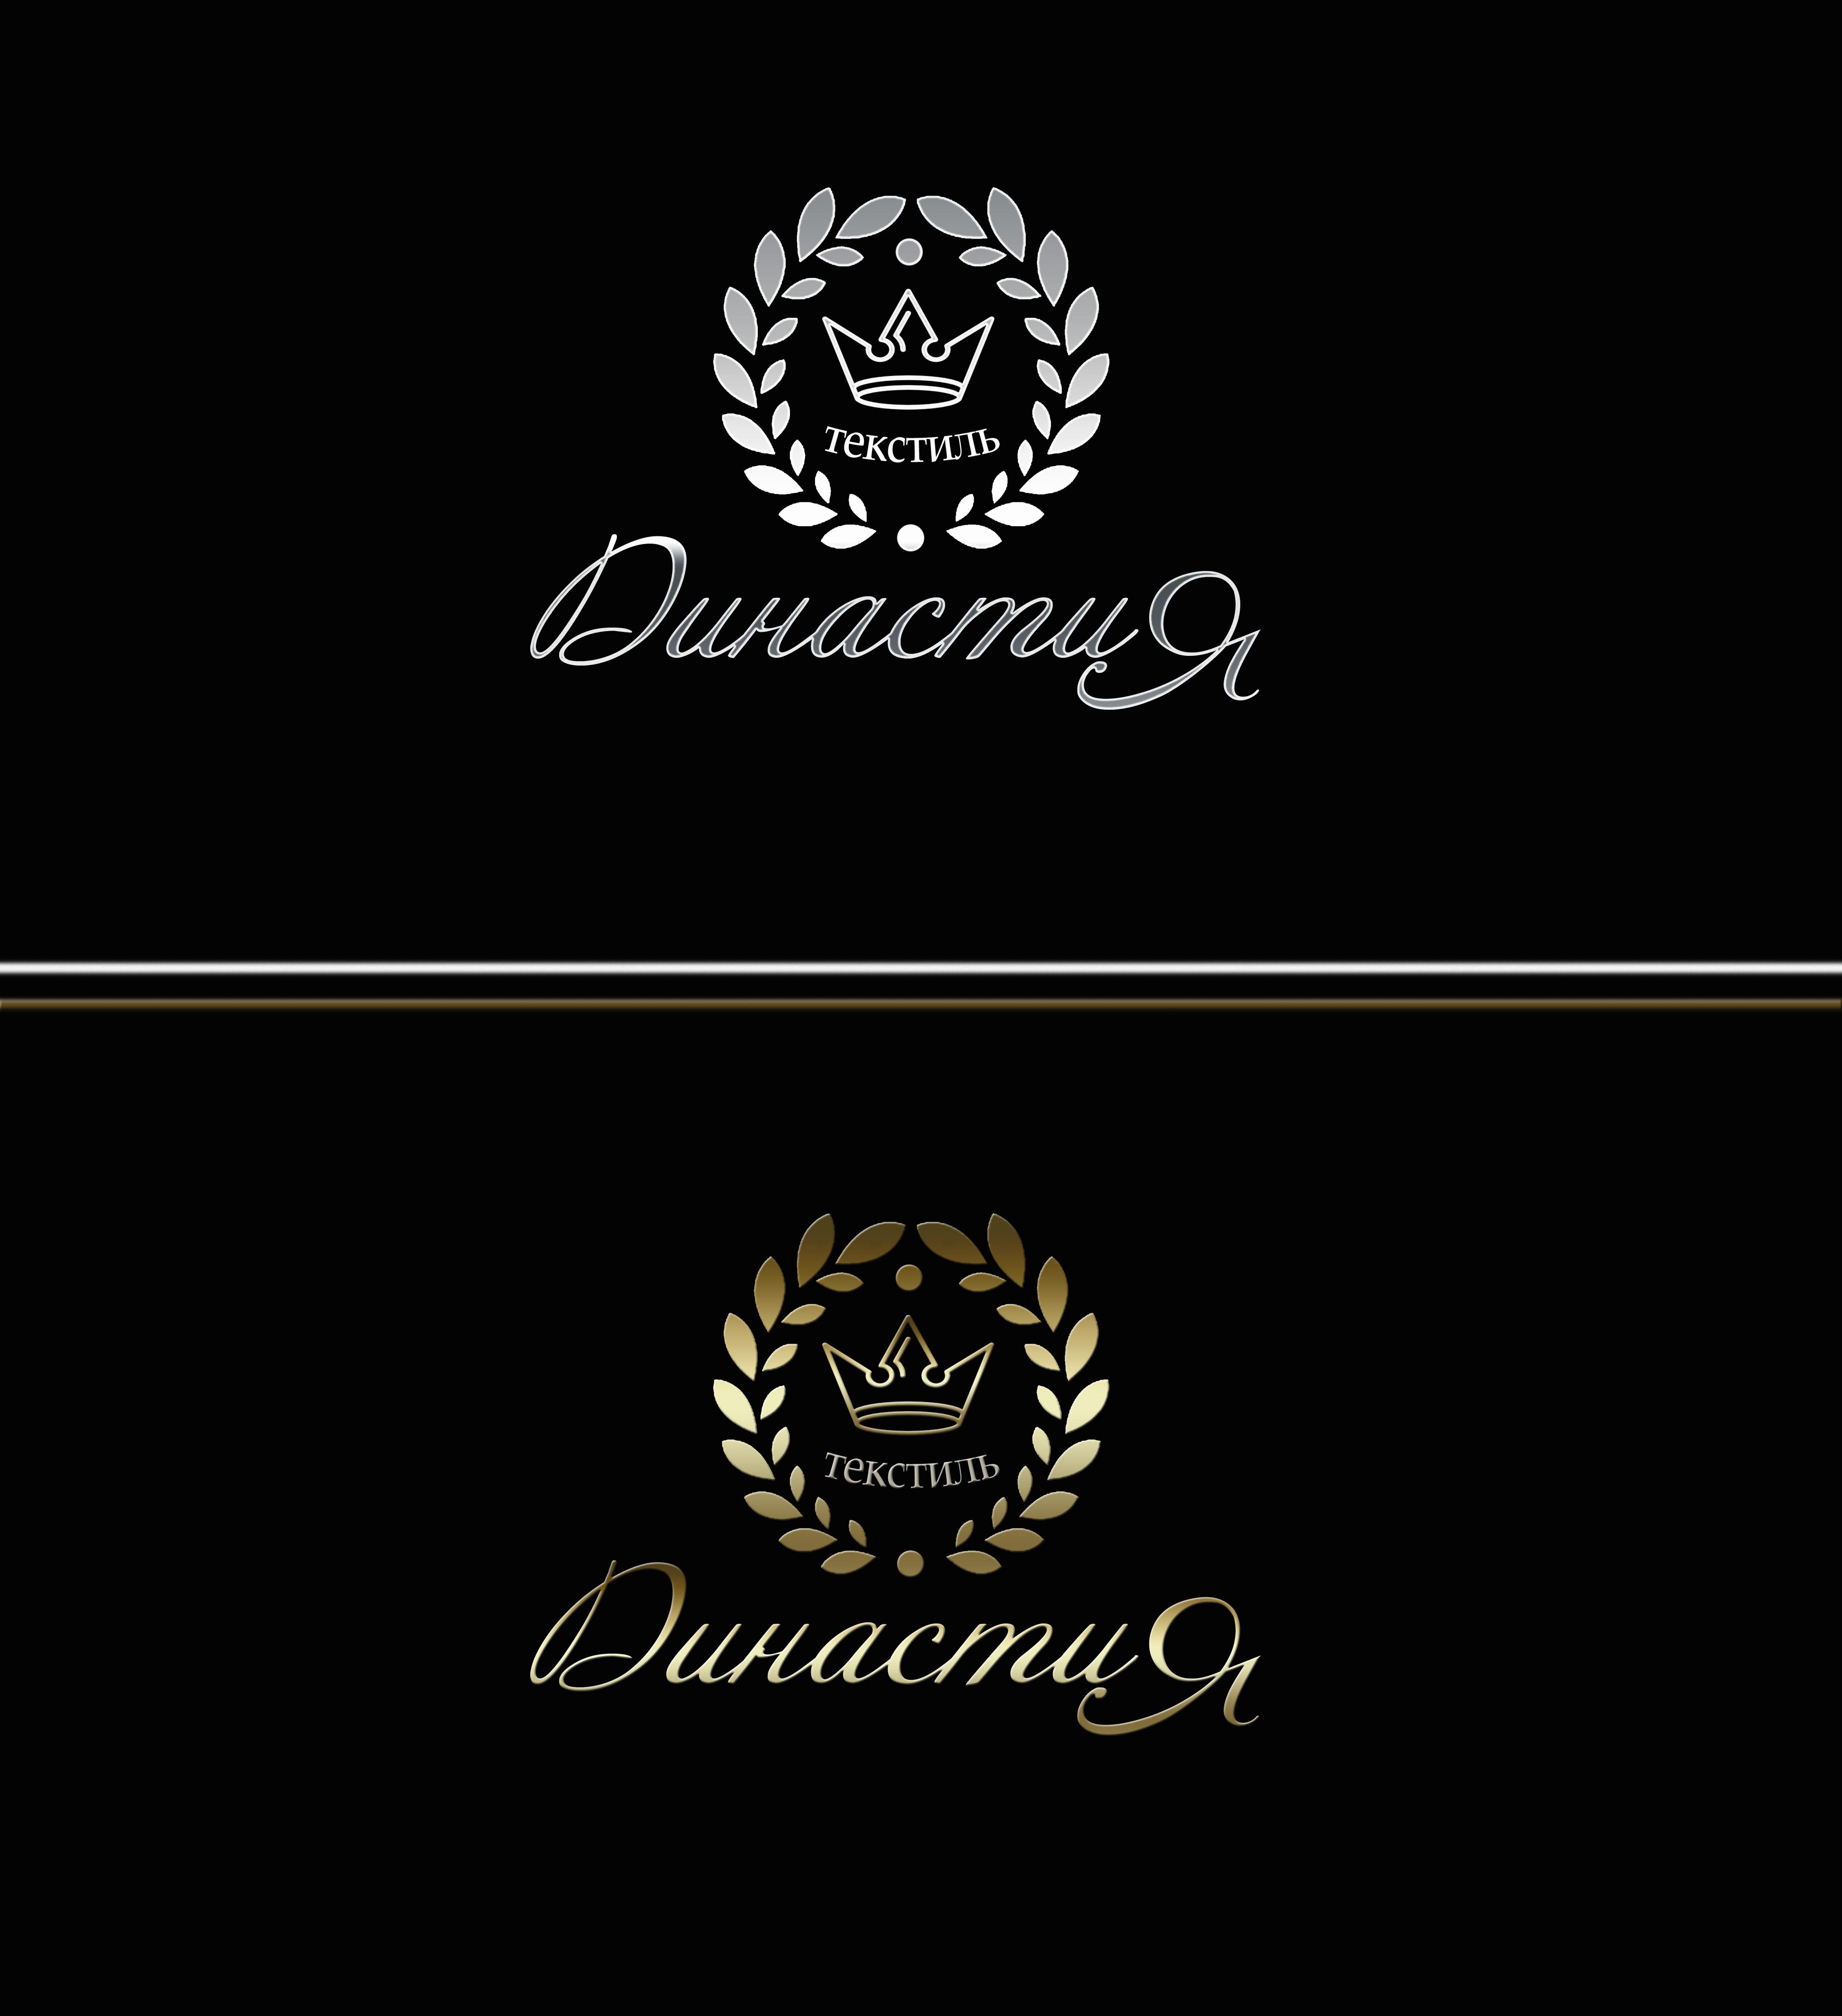 Разработать логотип для нового бренда фото f_61459e46e4b71446.jpg